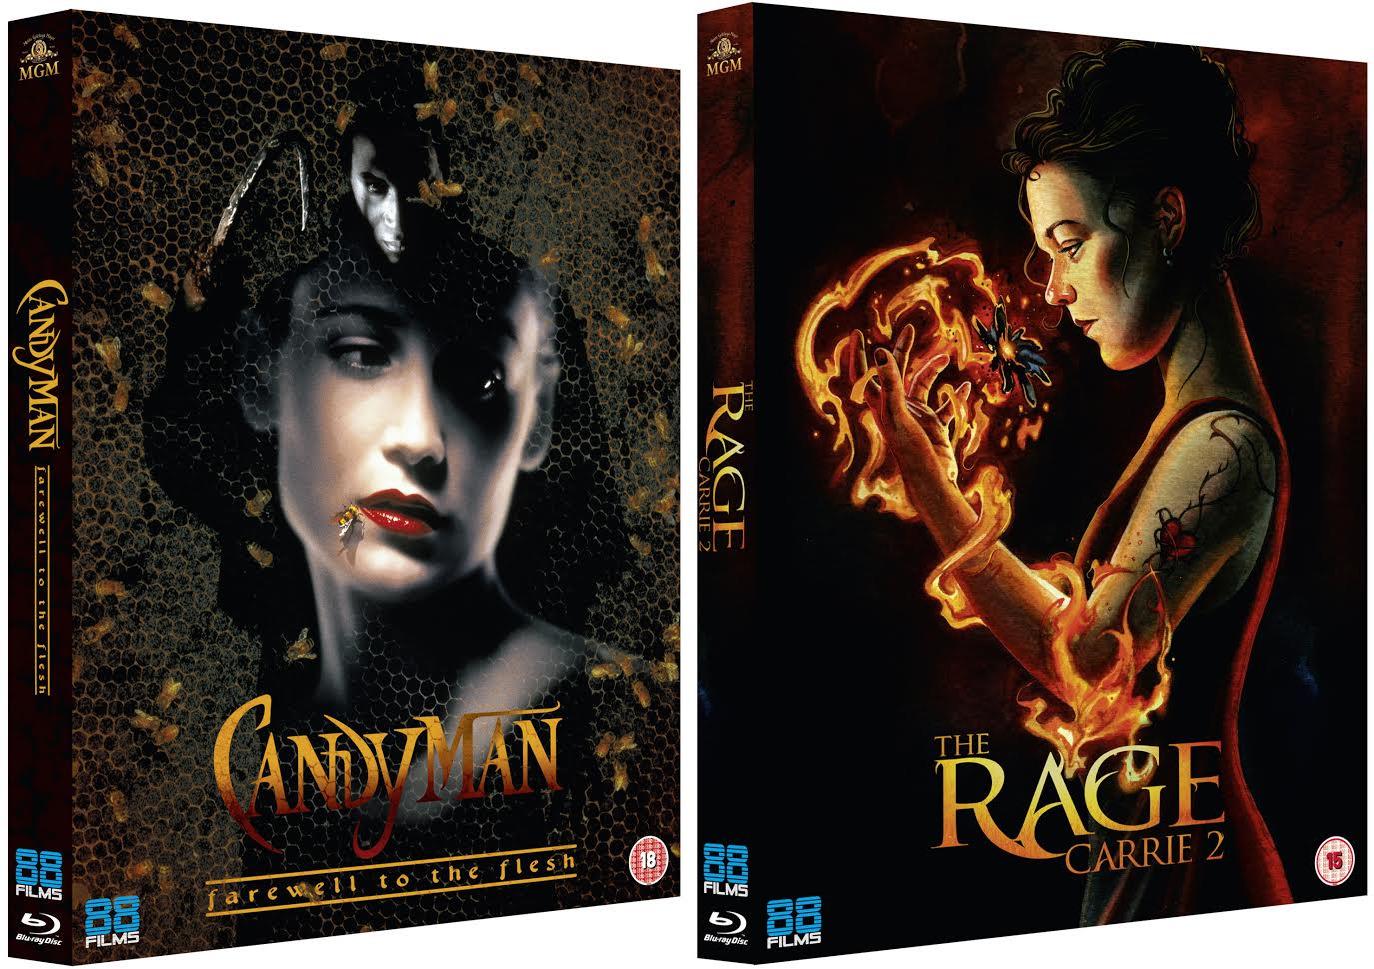 [News] 88 Films Presents Two Classic 90's Horror Sequels